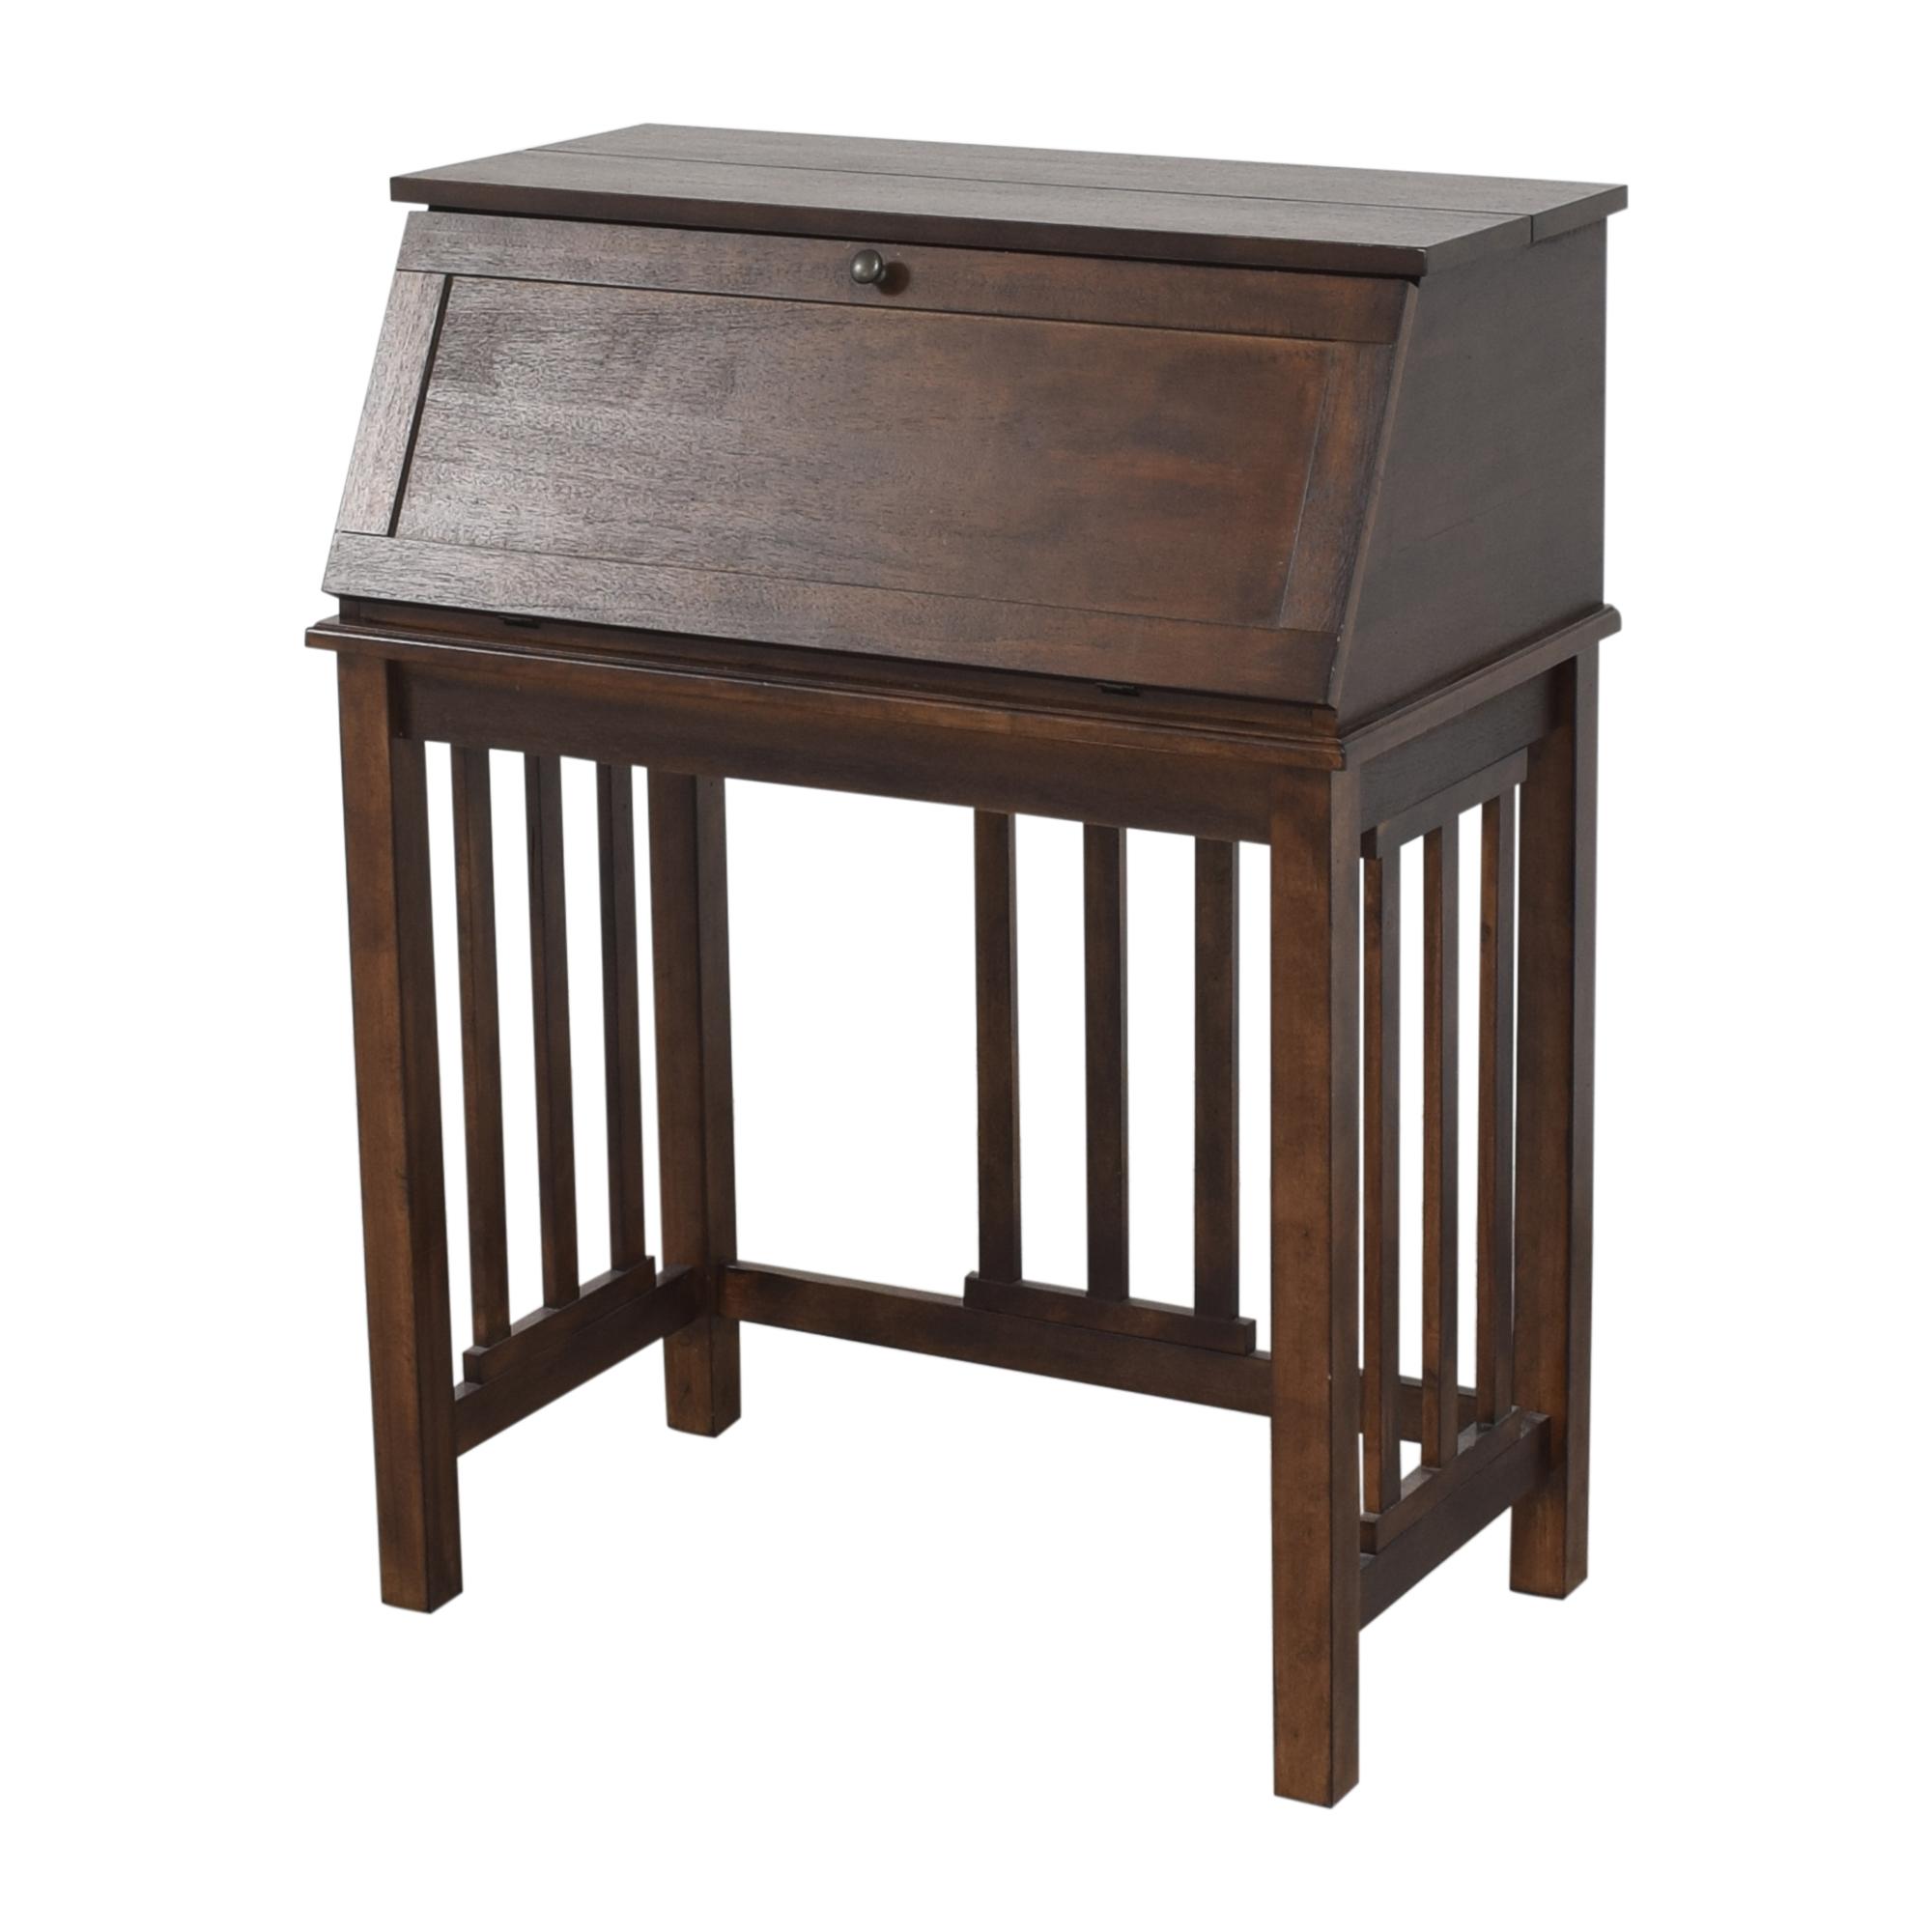 Ashley Furniture Ashley Furniture Harpan Desk ct